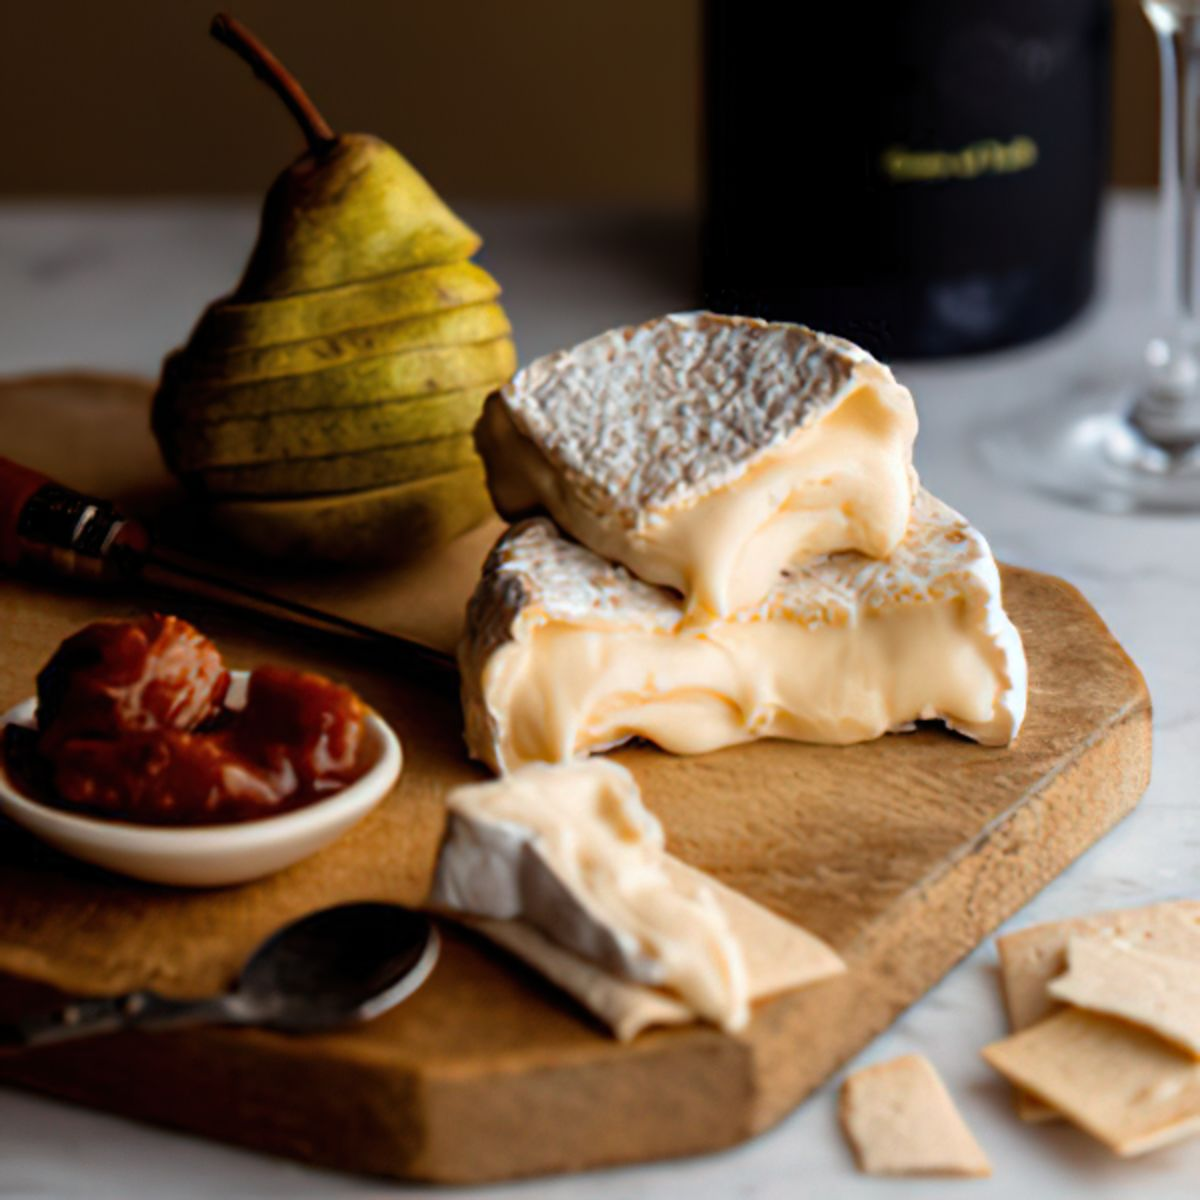 Bruny Island Cheese Co. The Saint